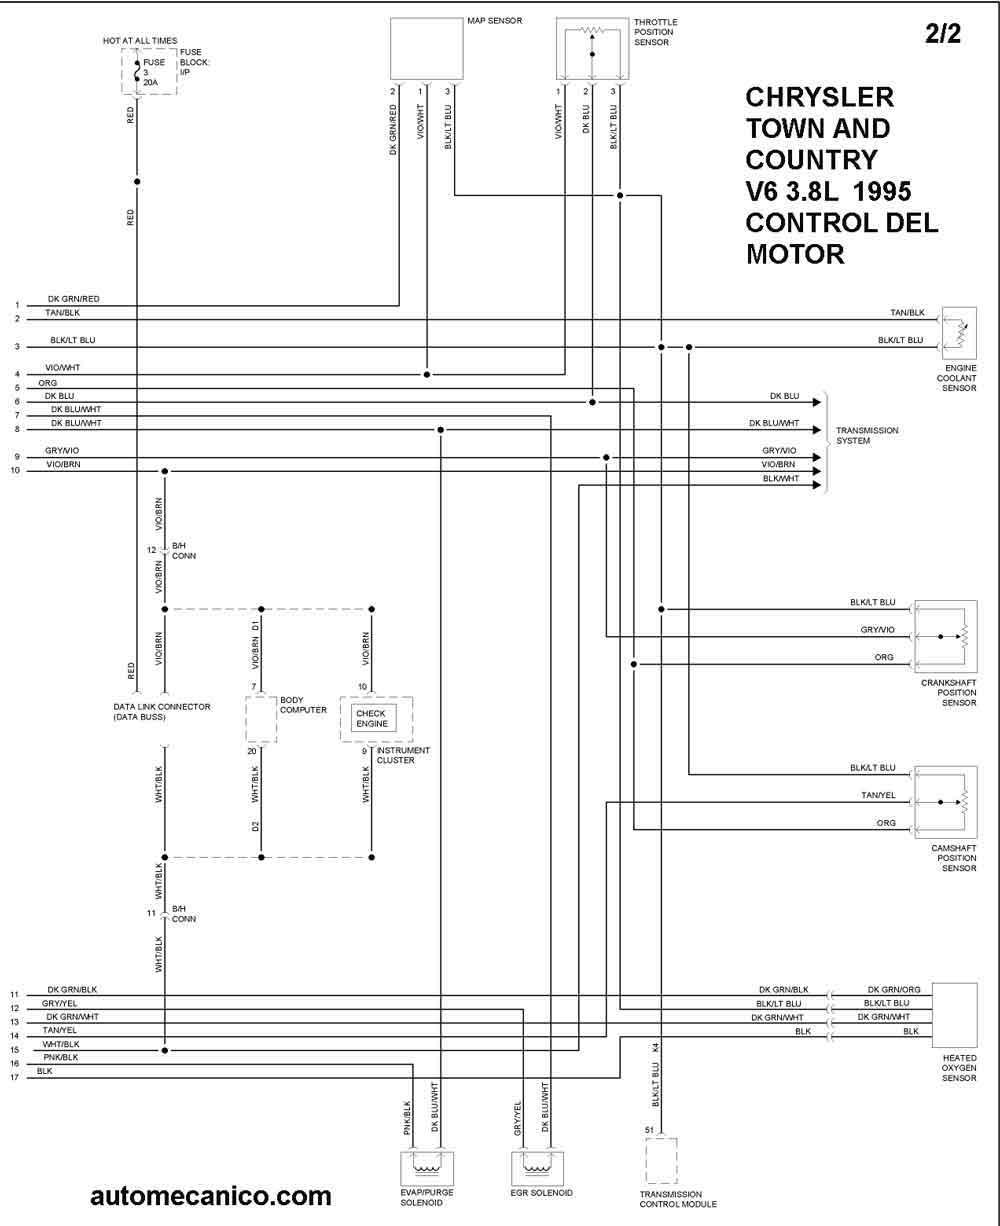 chrysler lhs wiring diagram chrysler 1995 diagramas control del motor graphics #9